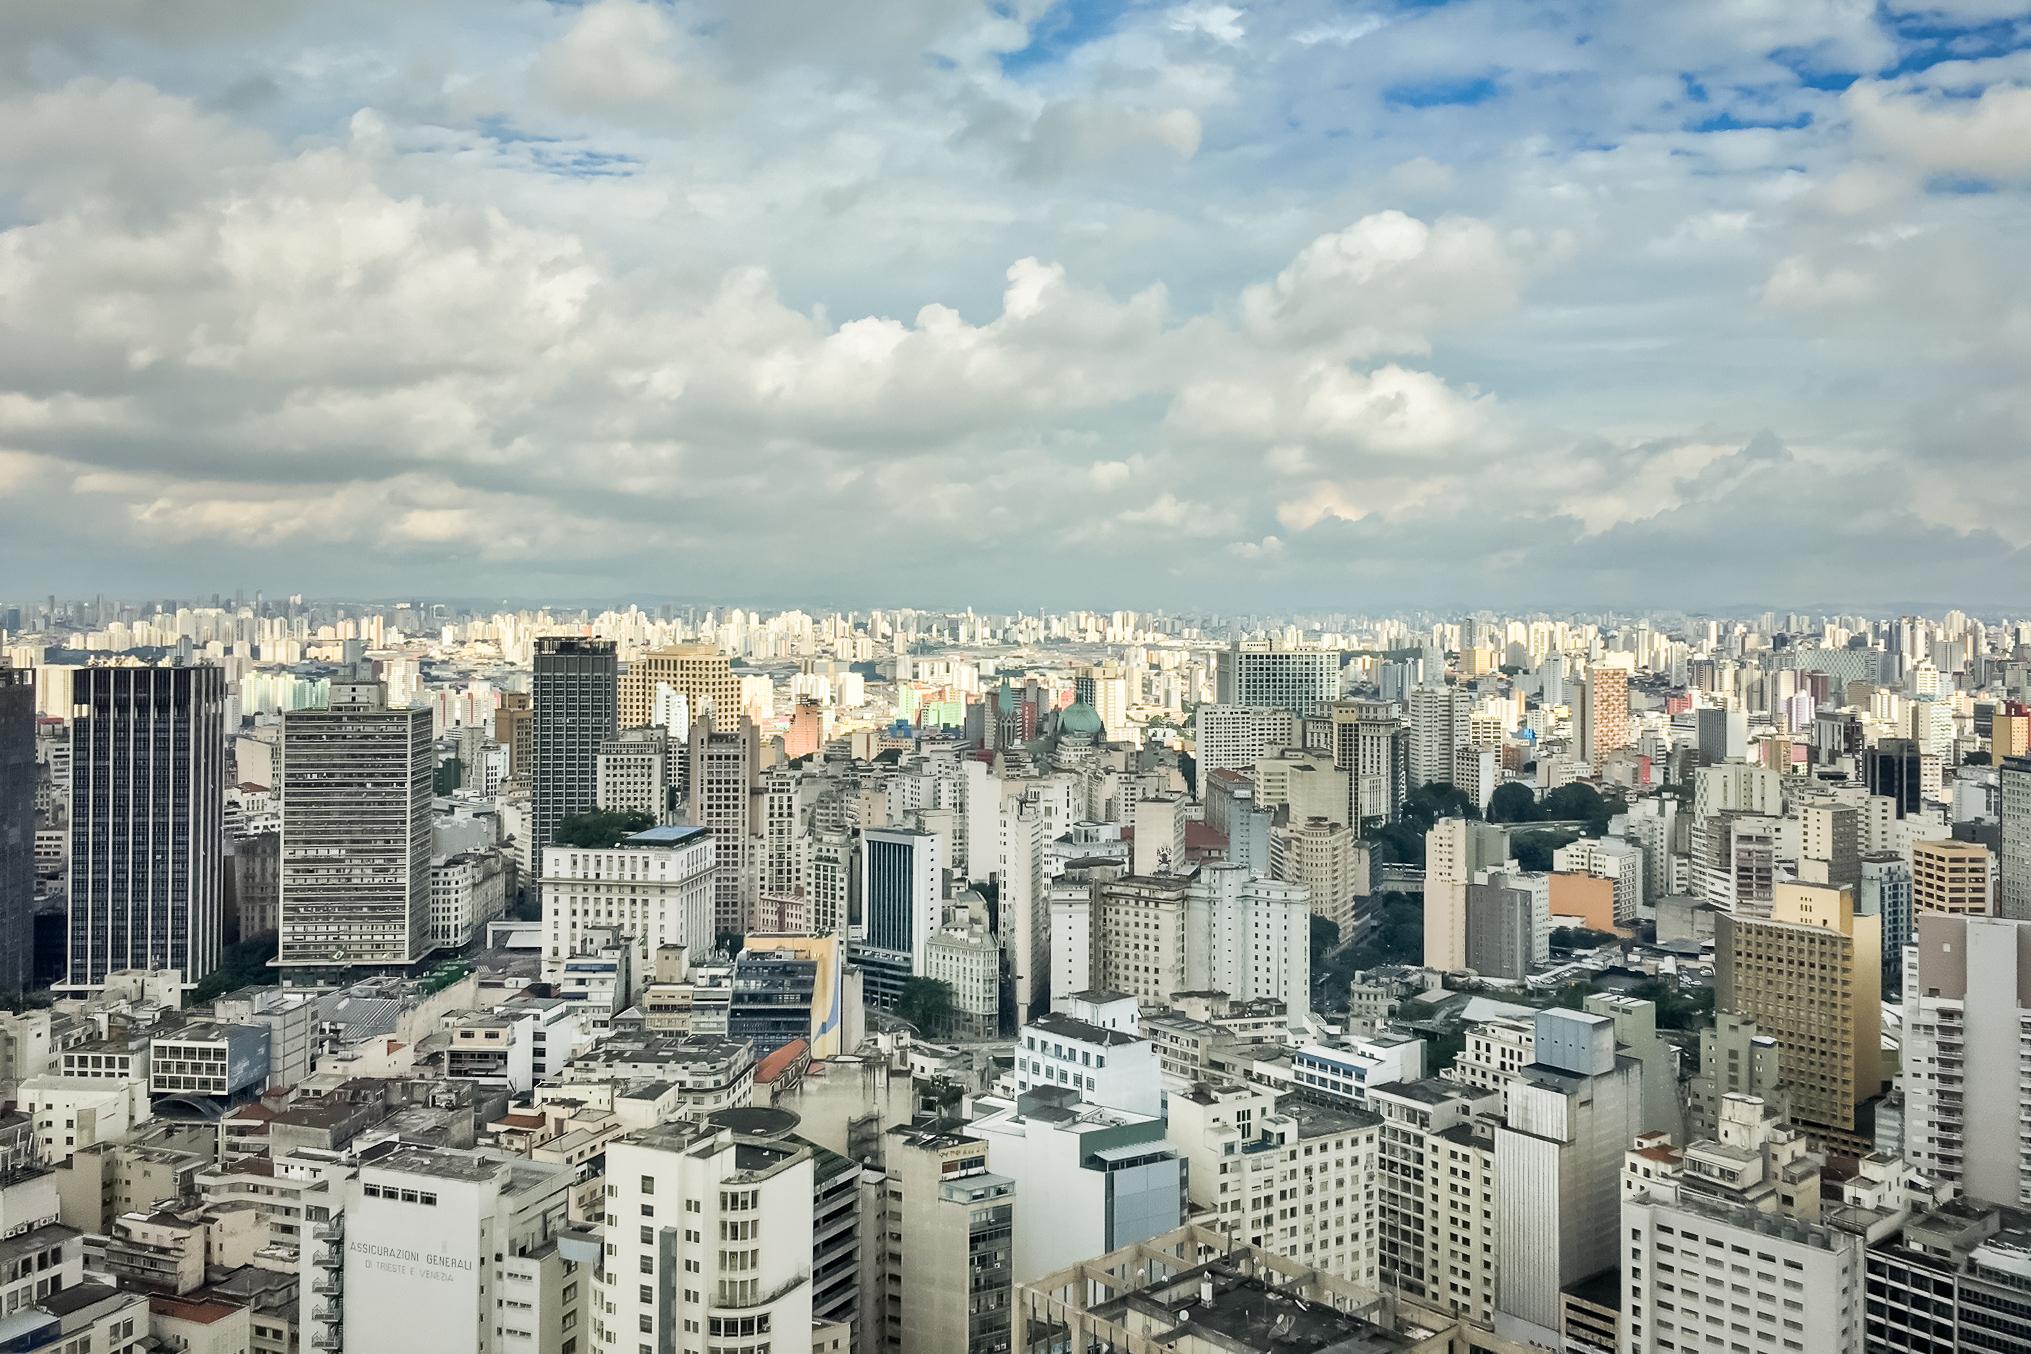 CityMix_SaoPaolo_Final-187